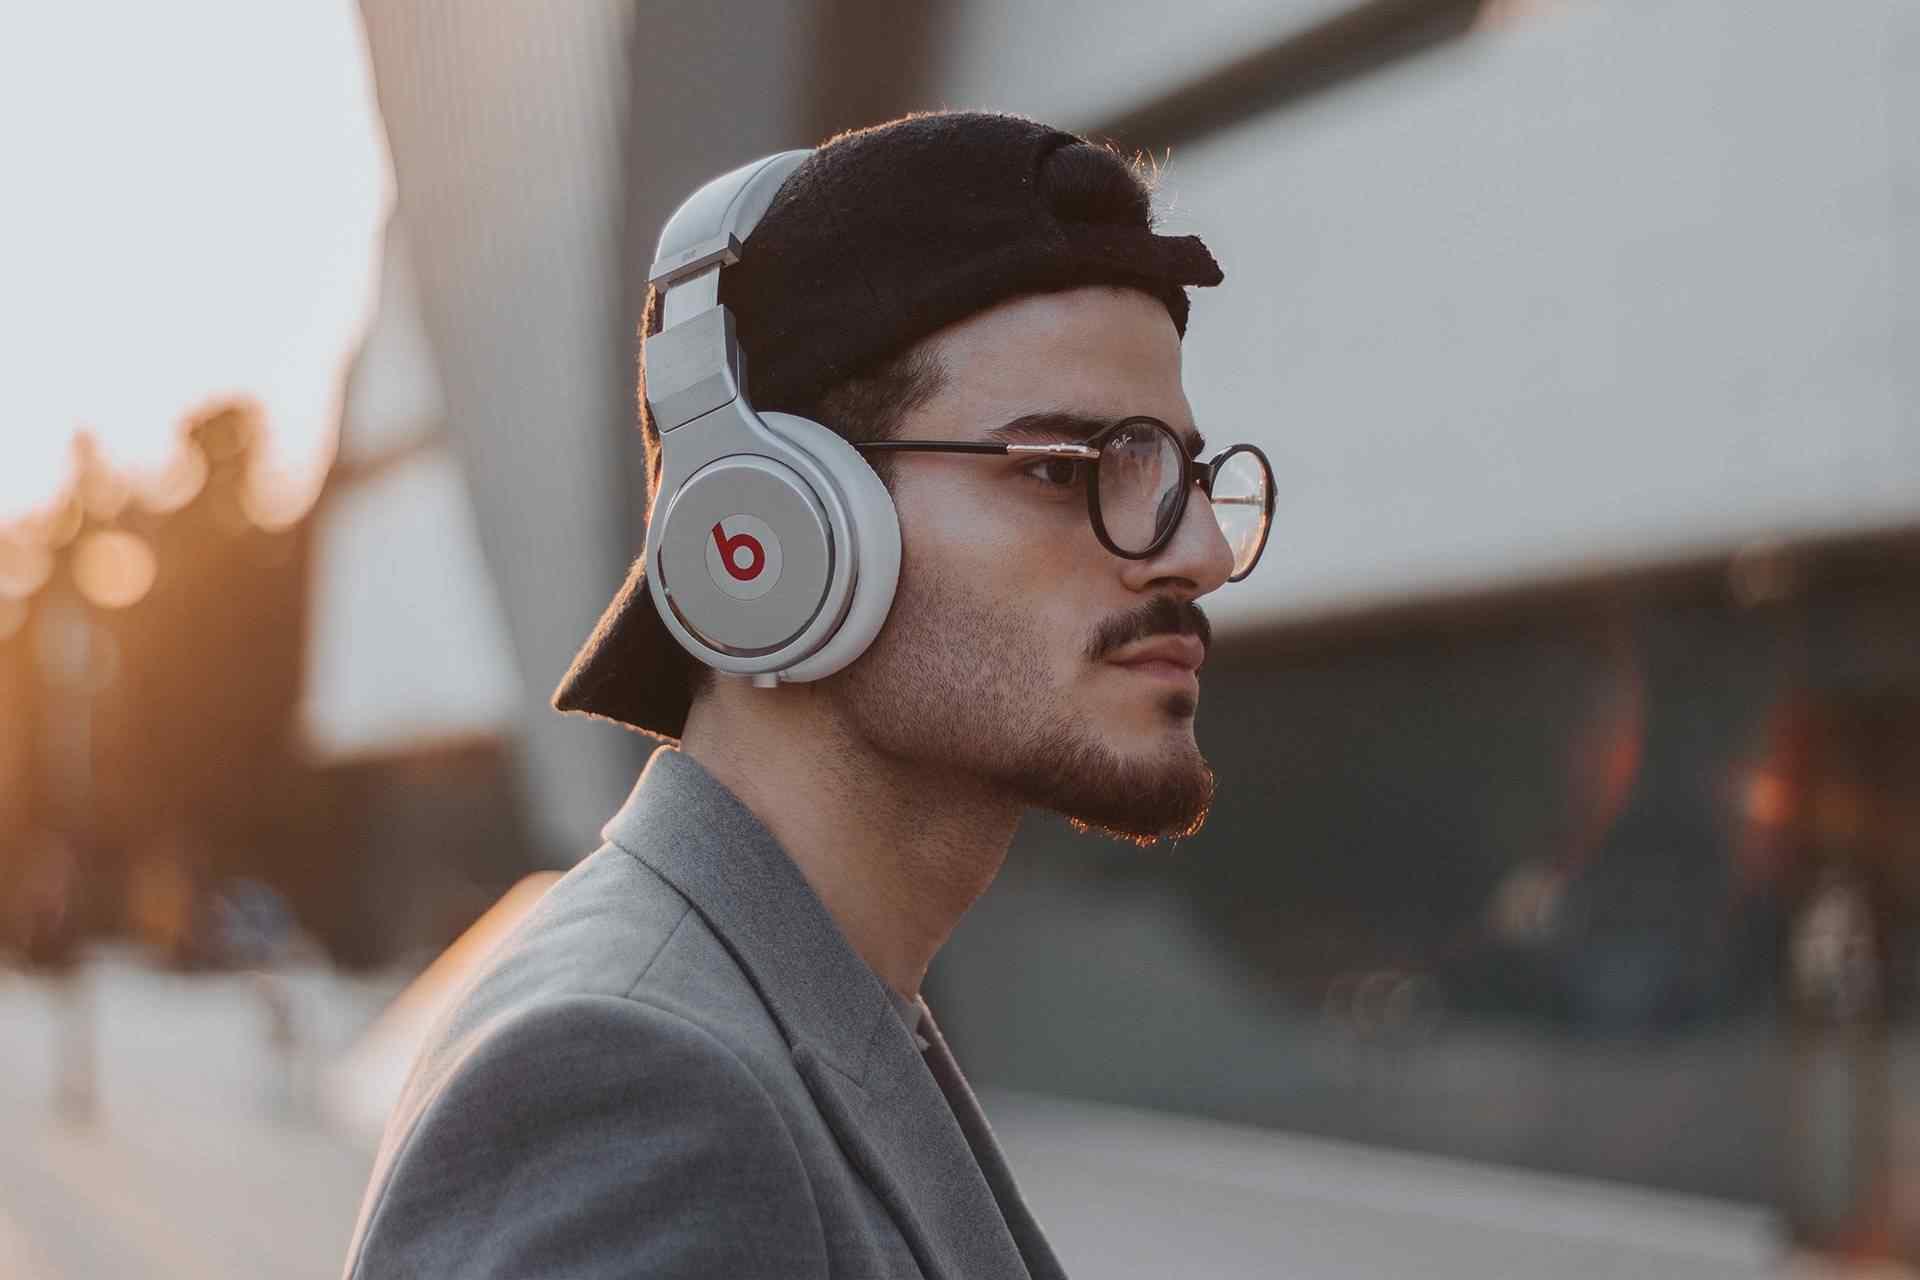 How to choose headphones